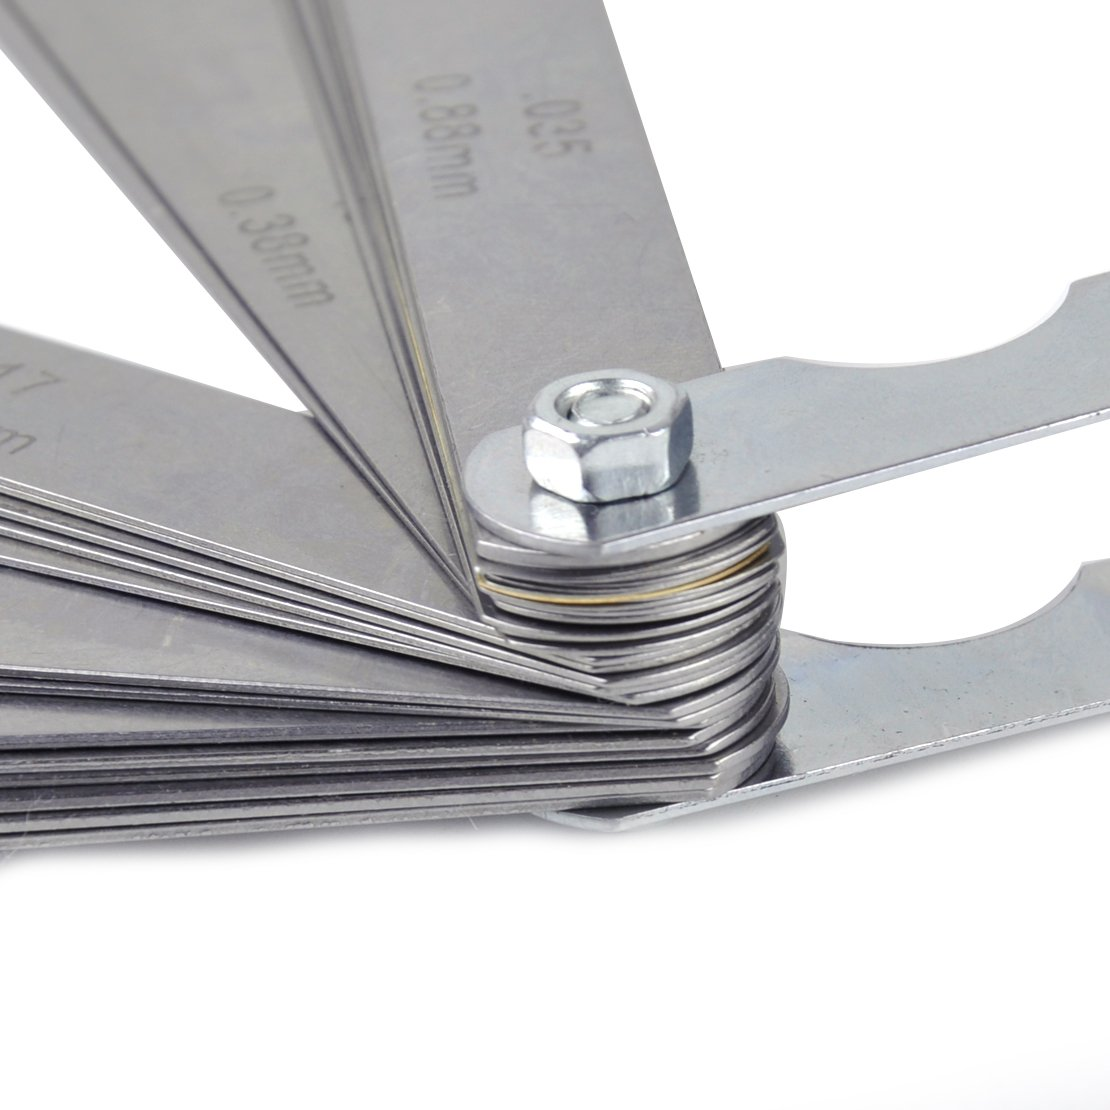 beler 32 Blade Dual Lese Kombination Master Fehler Dickenmessger/ät Kit Metric Messwerkzeug